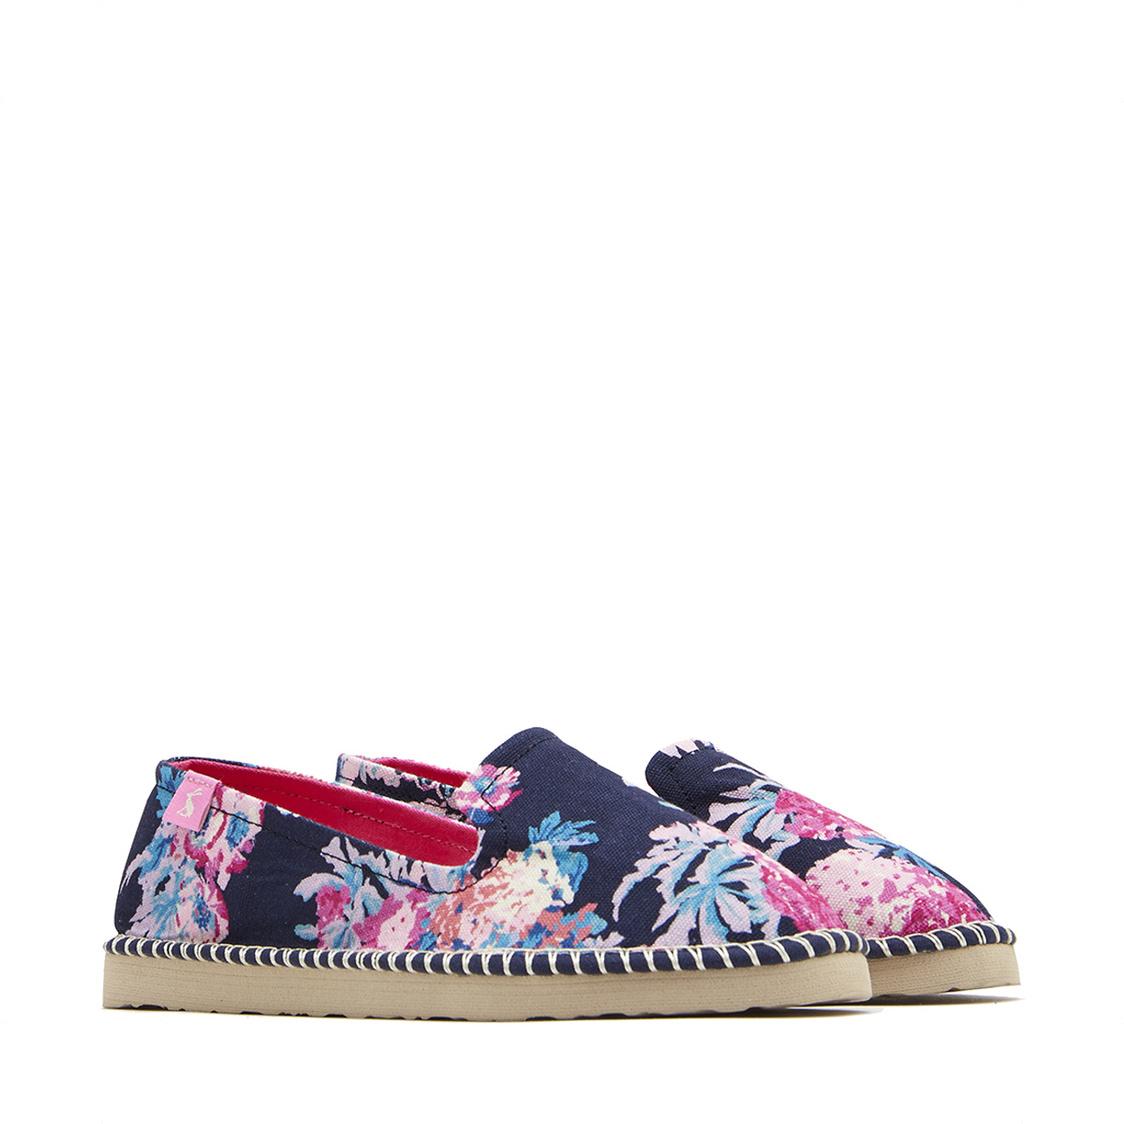 Tom Joule Flipadrille Lightweight Summer Shoe Dark Blue Floral